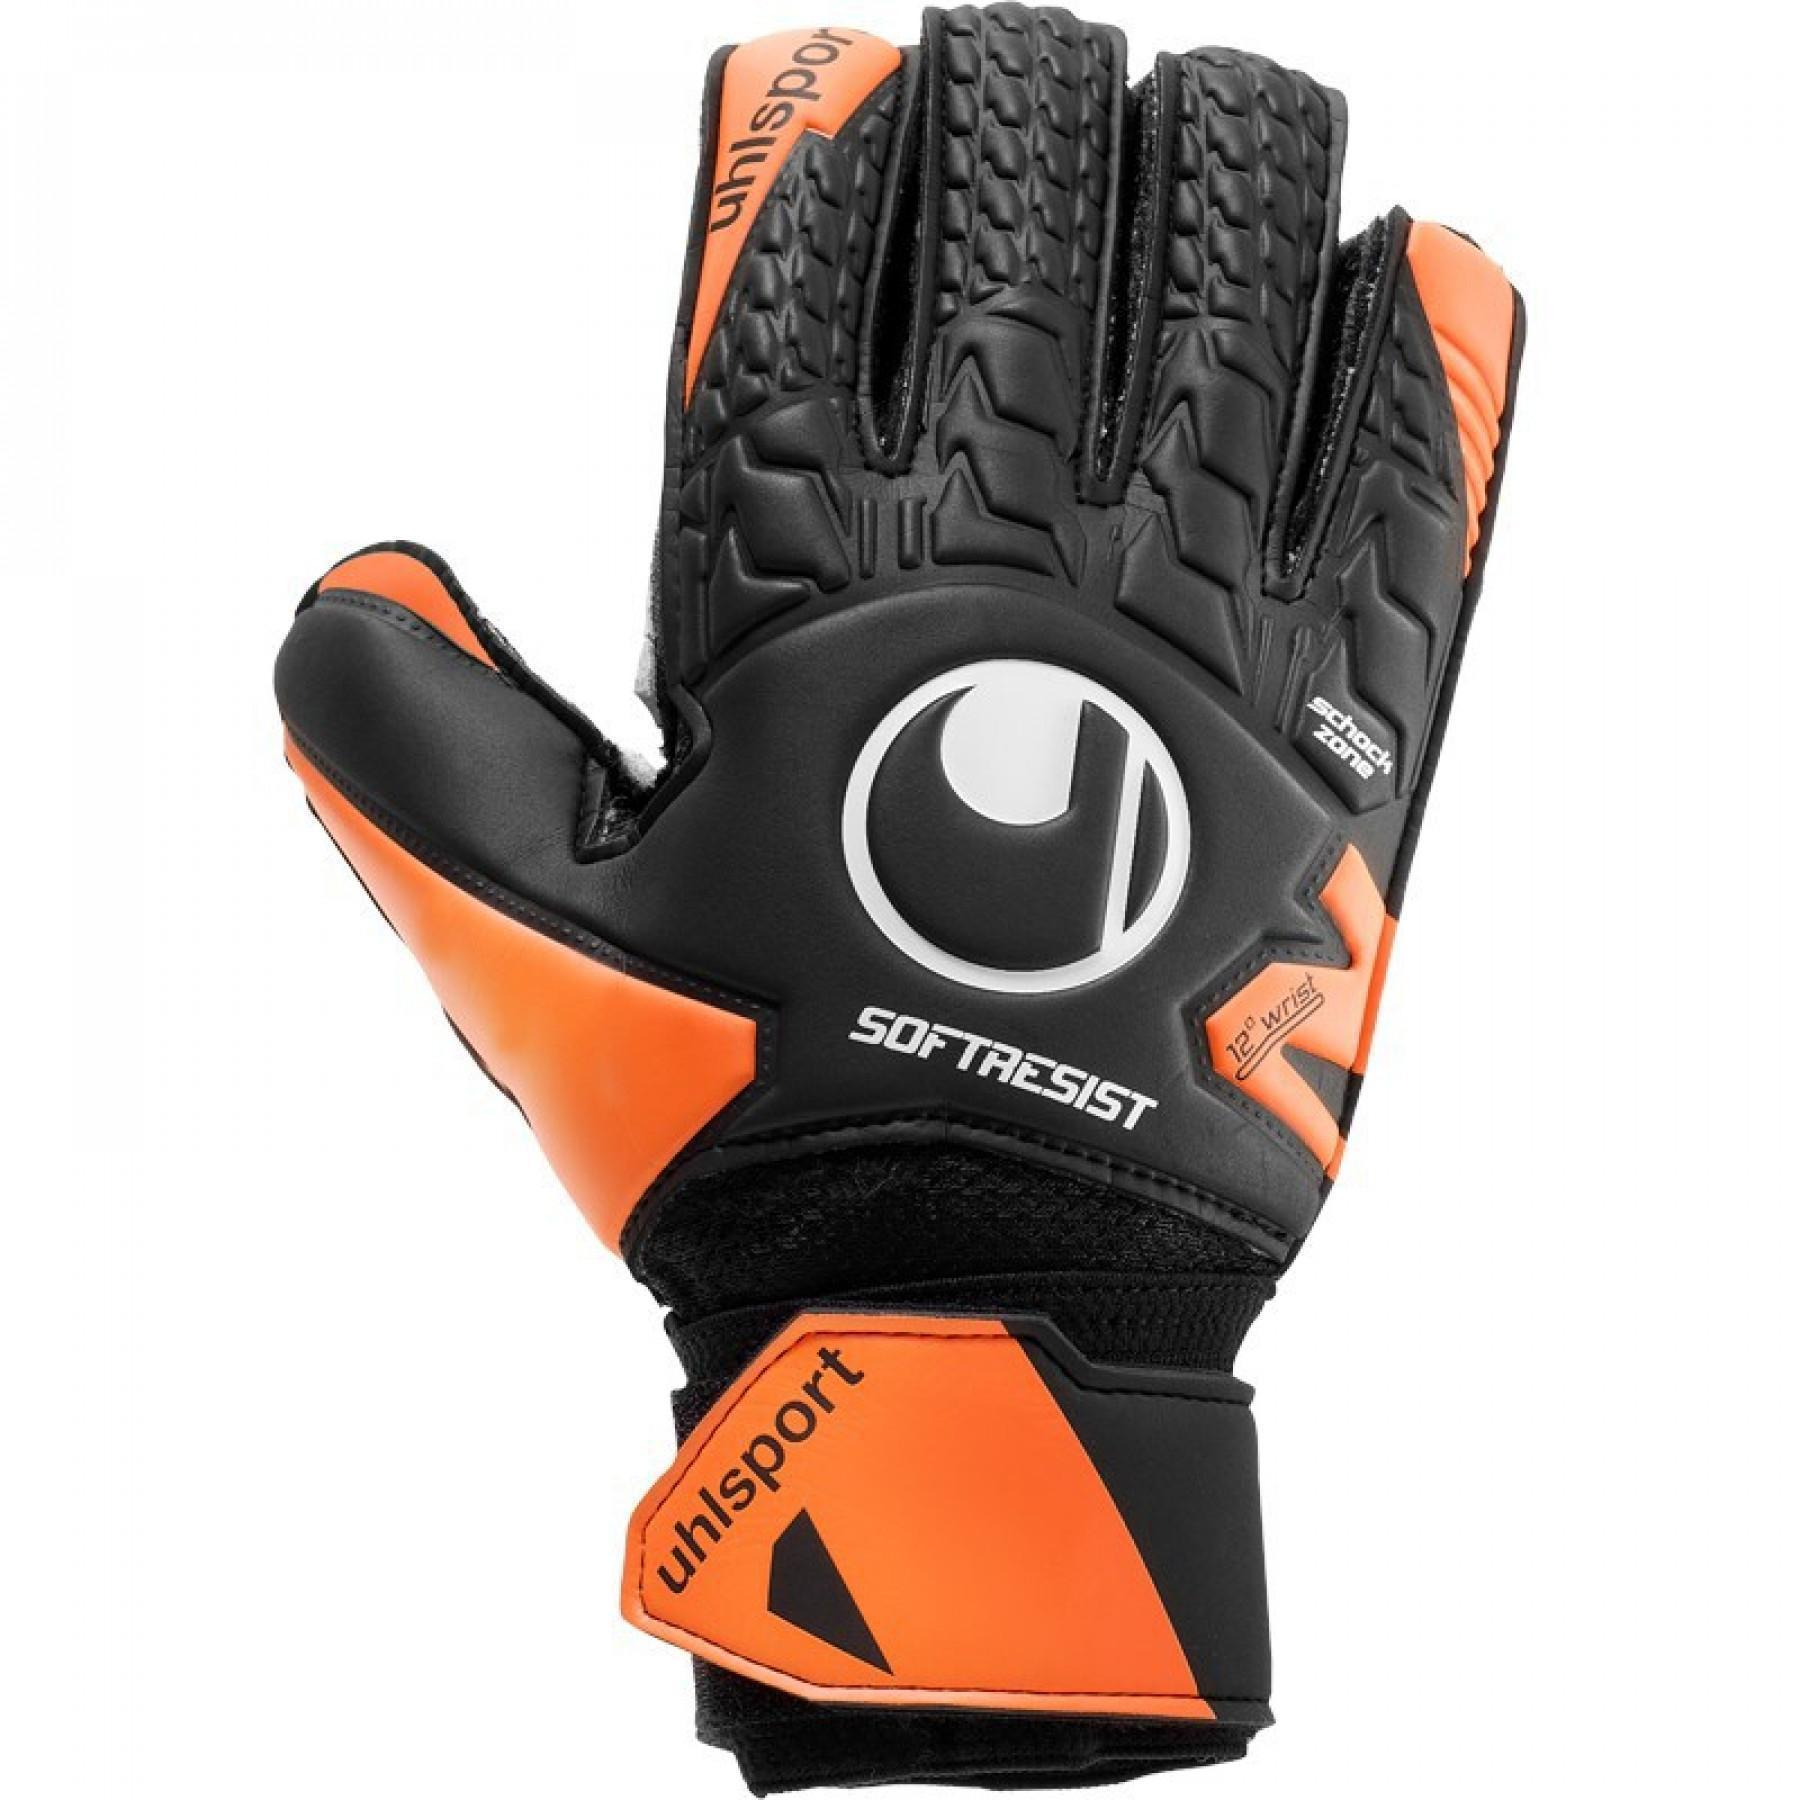 Uhlsport Soft Resist Flex Frame Goalie Handschoenen